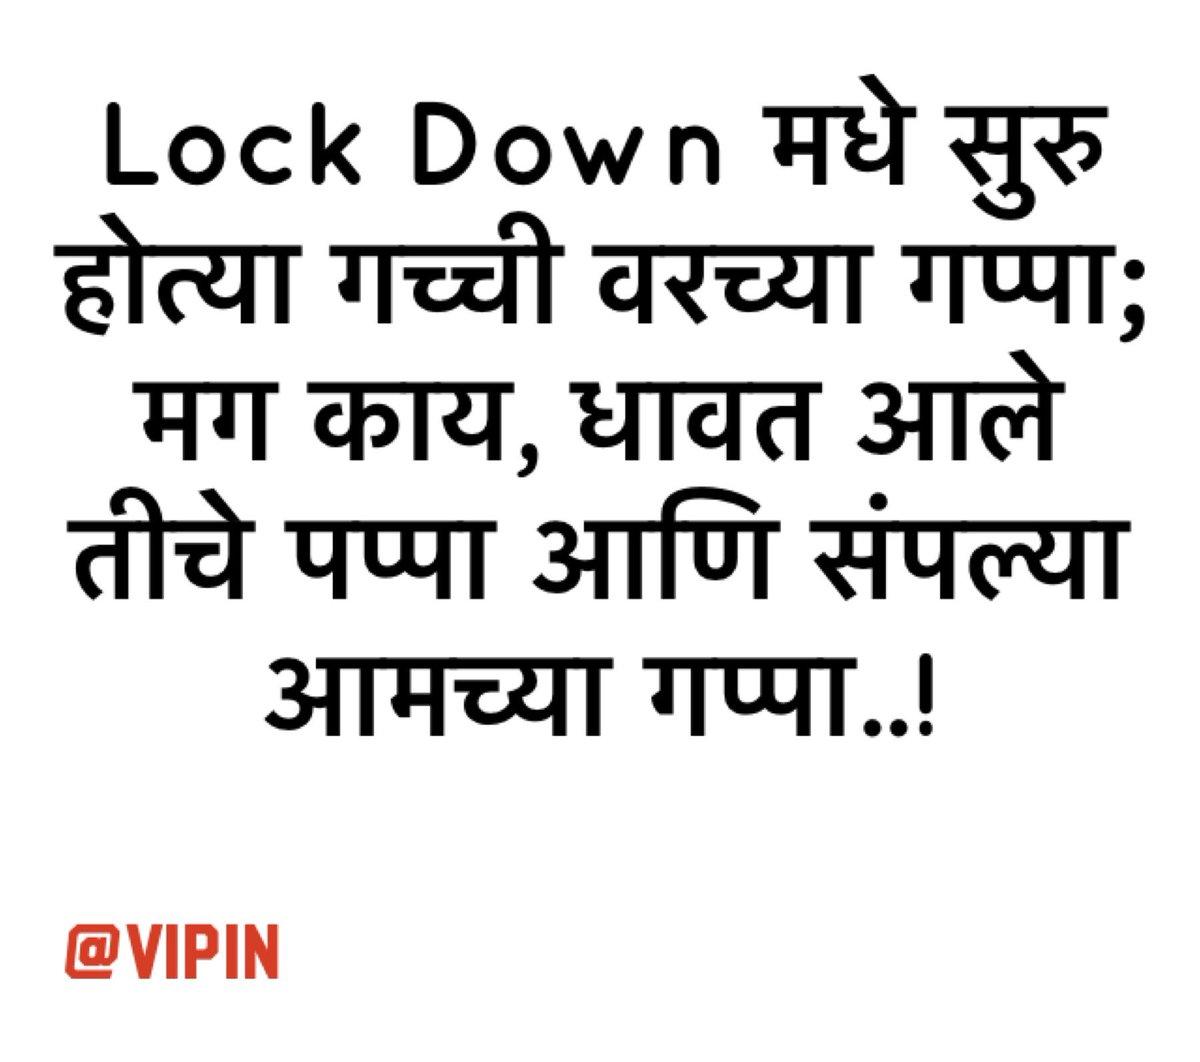 #lockdownspecial #rooftalk #shortstory #marathi #marathimulgi pic.twitter.com/ThOD6bDveO